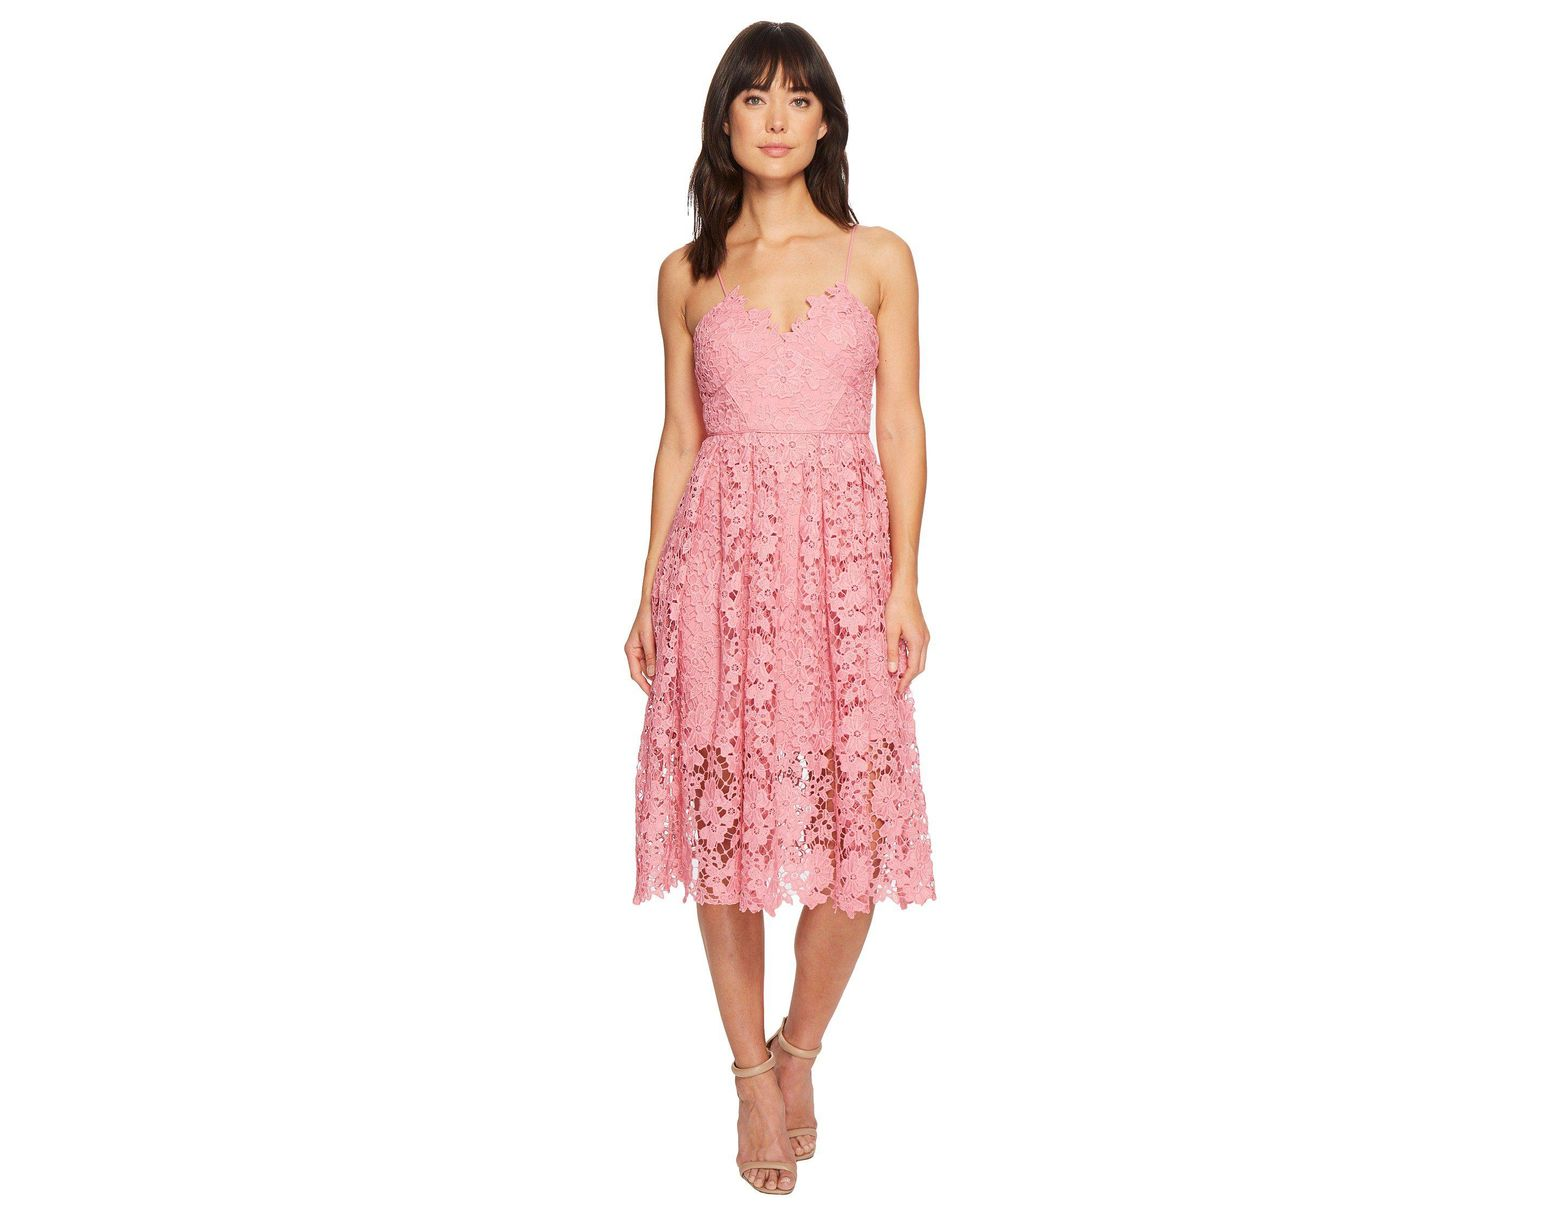 3dff05a9b9 Donna Morgan Spaghetti Strap Lace Midi Dress in Pink - Save 44% - Lyst